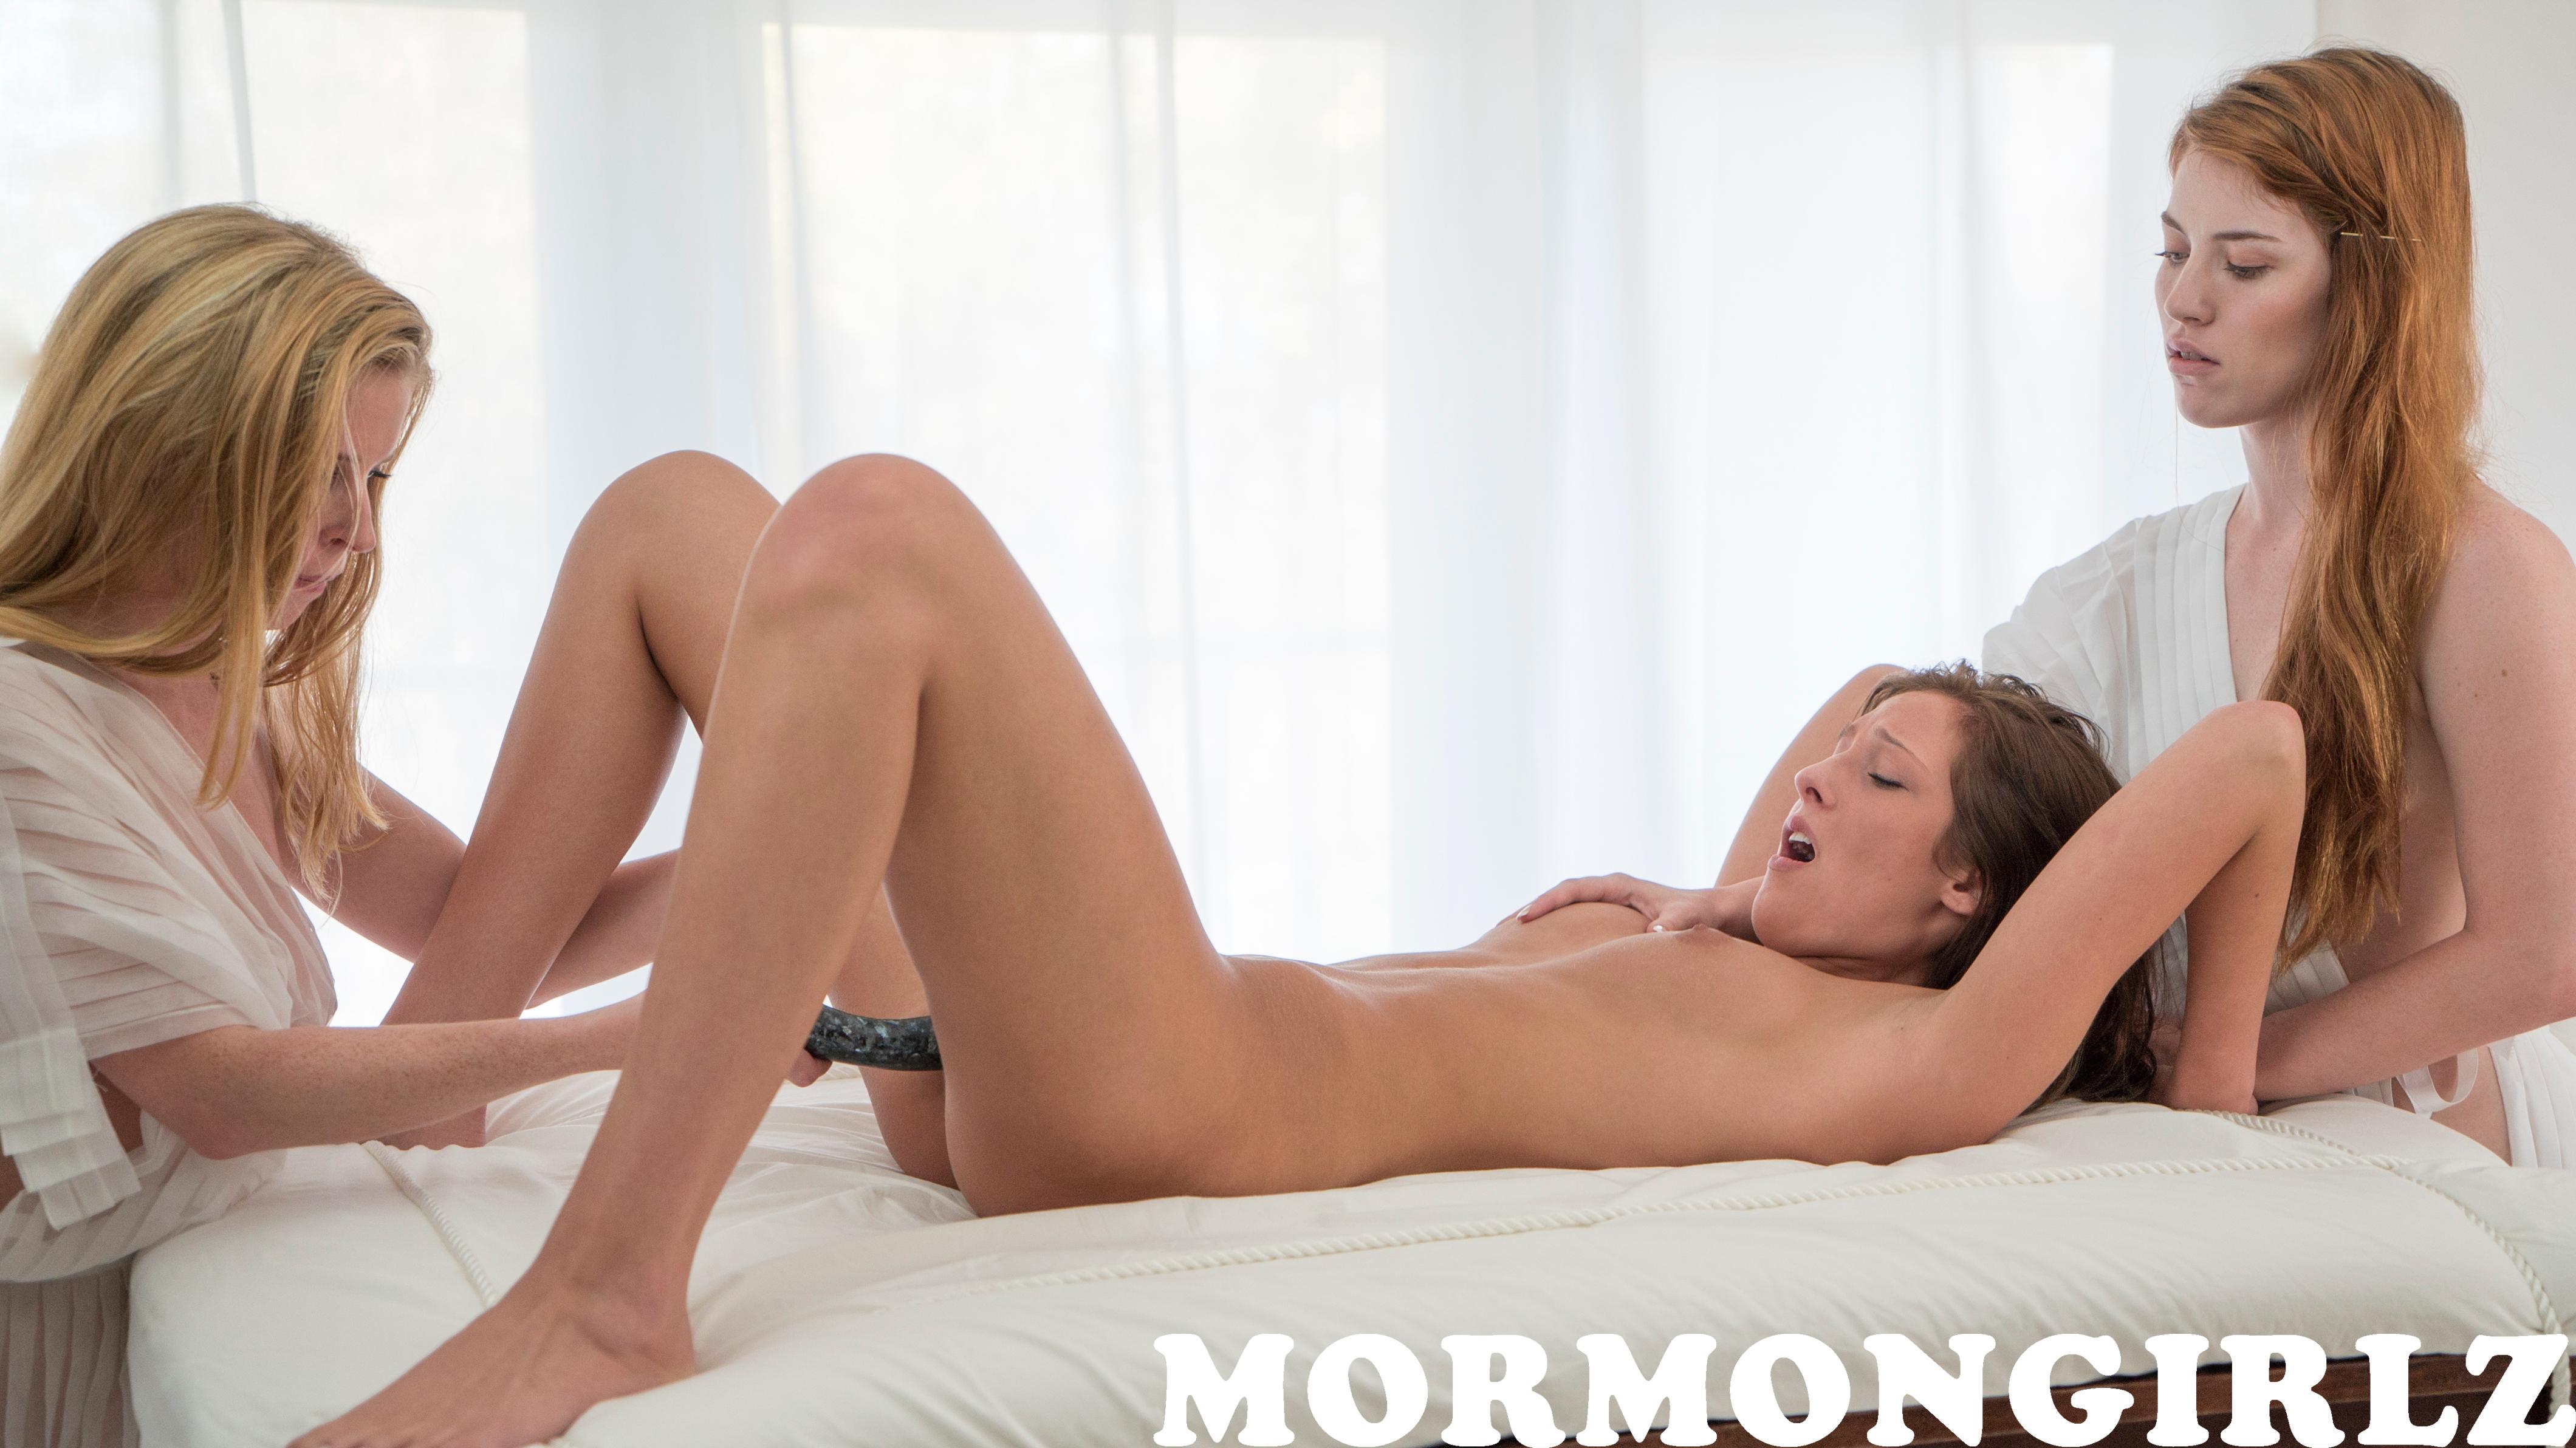 Wish cock Mormon girls nude